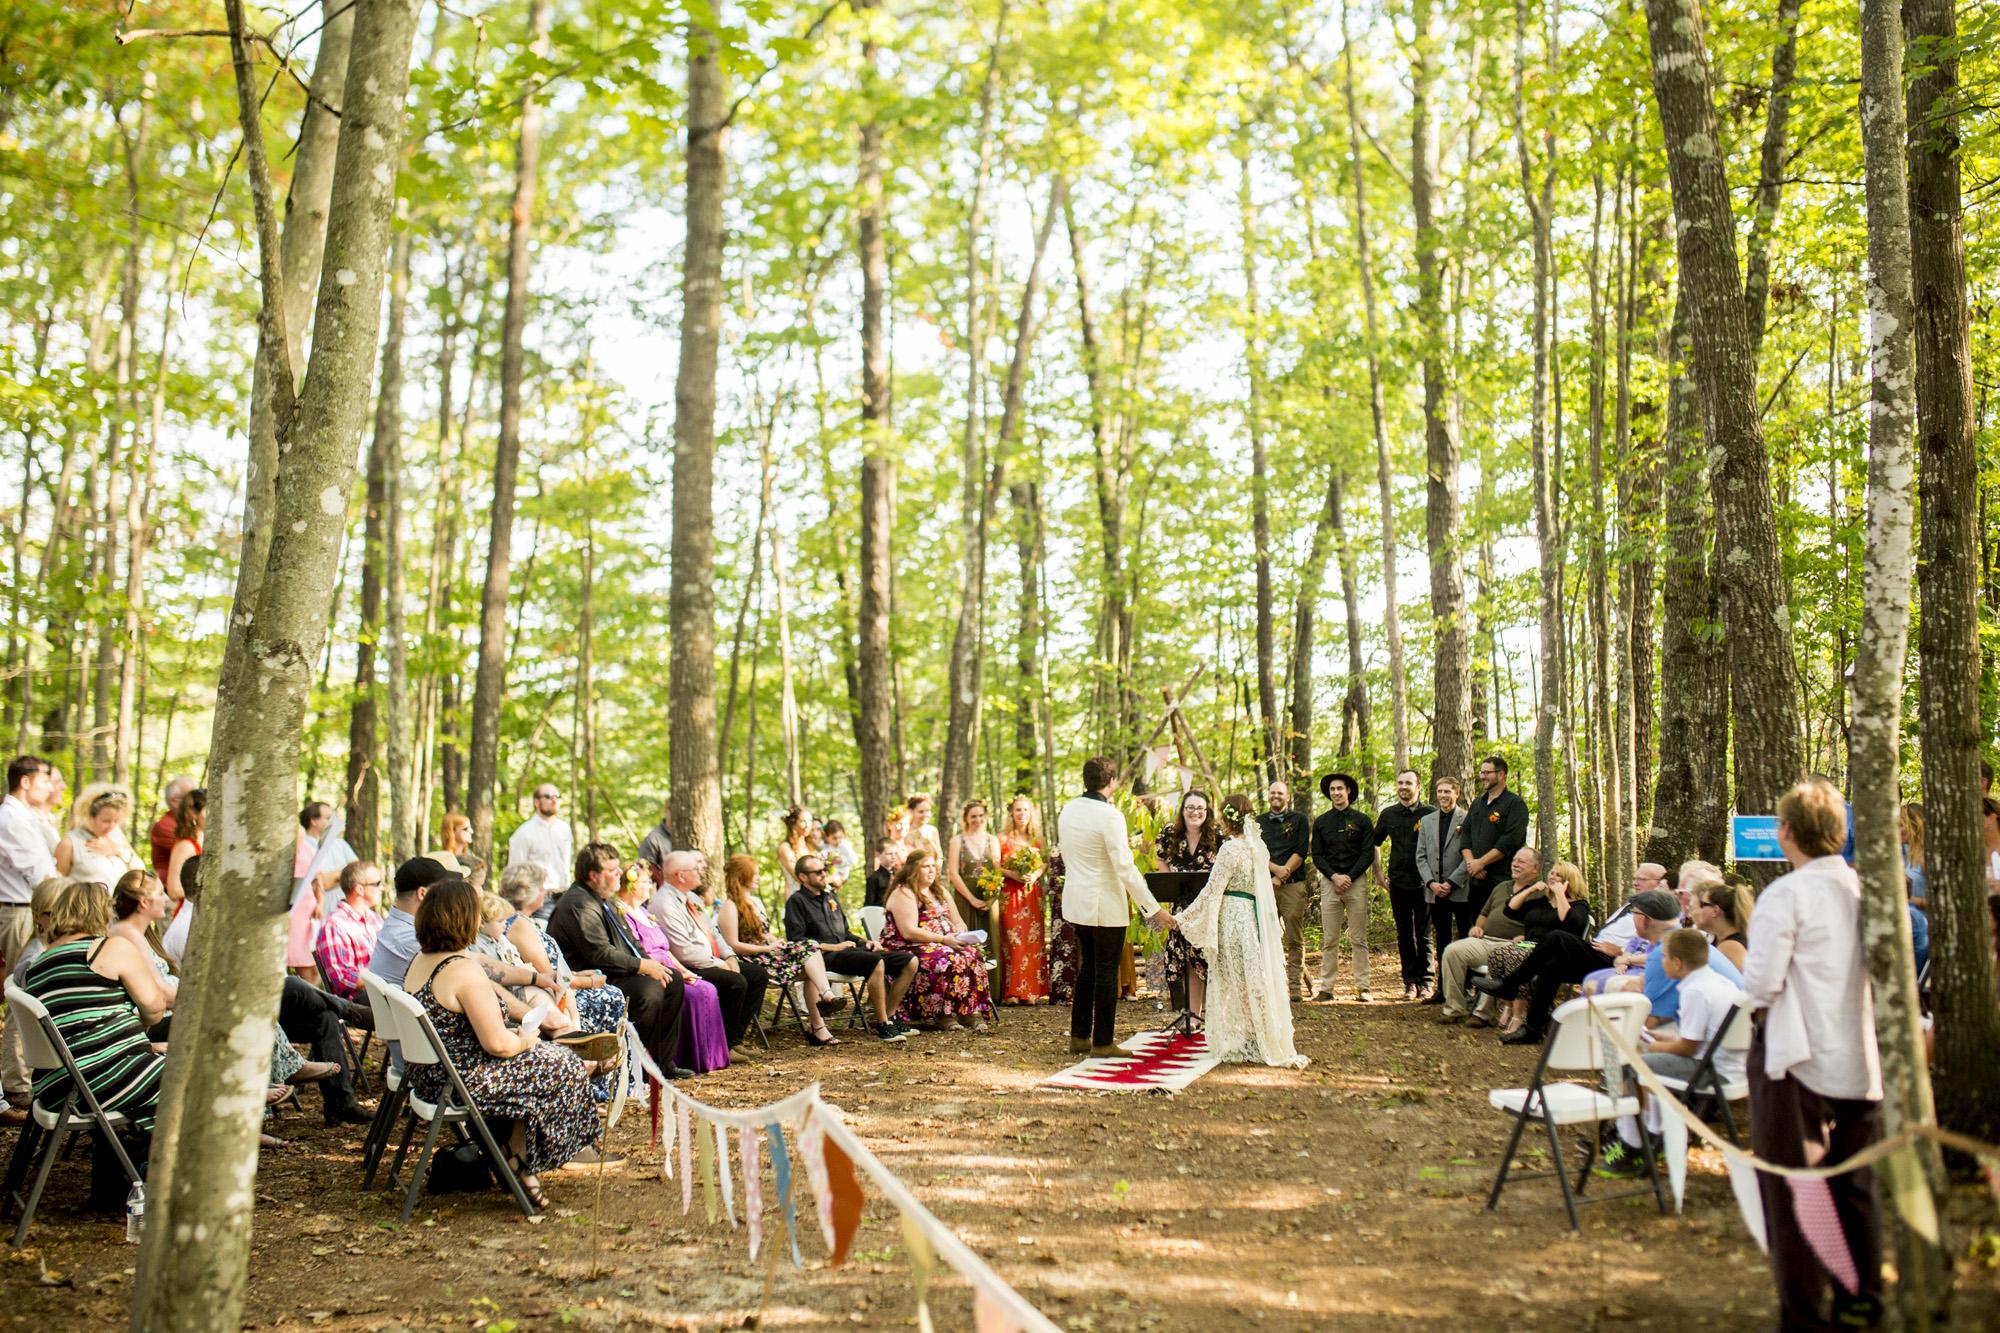 Seriously_Sabrina_Photography_Red_River_Gorge_Kentucky_Wedding_ShawnDana116.jpg